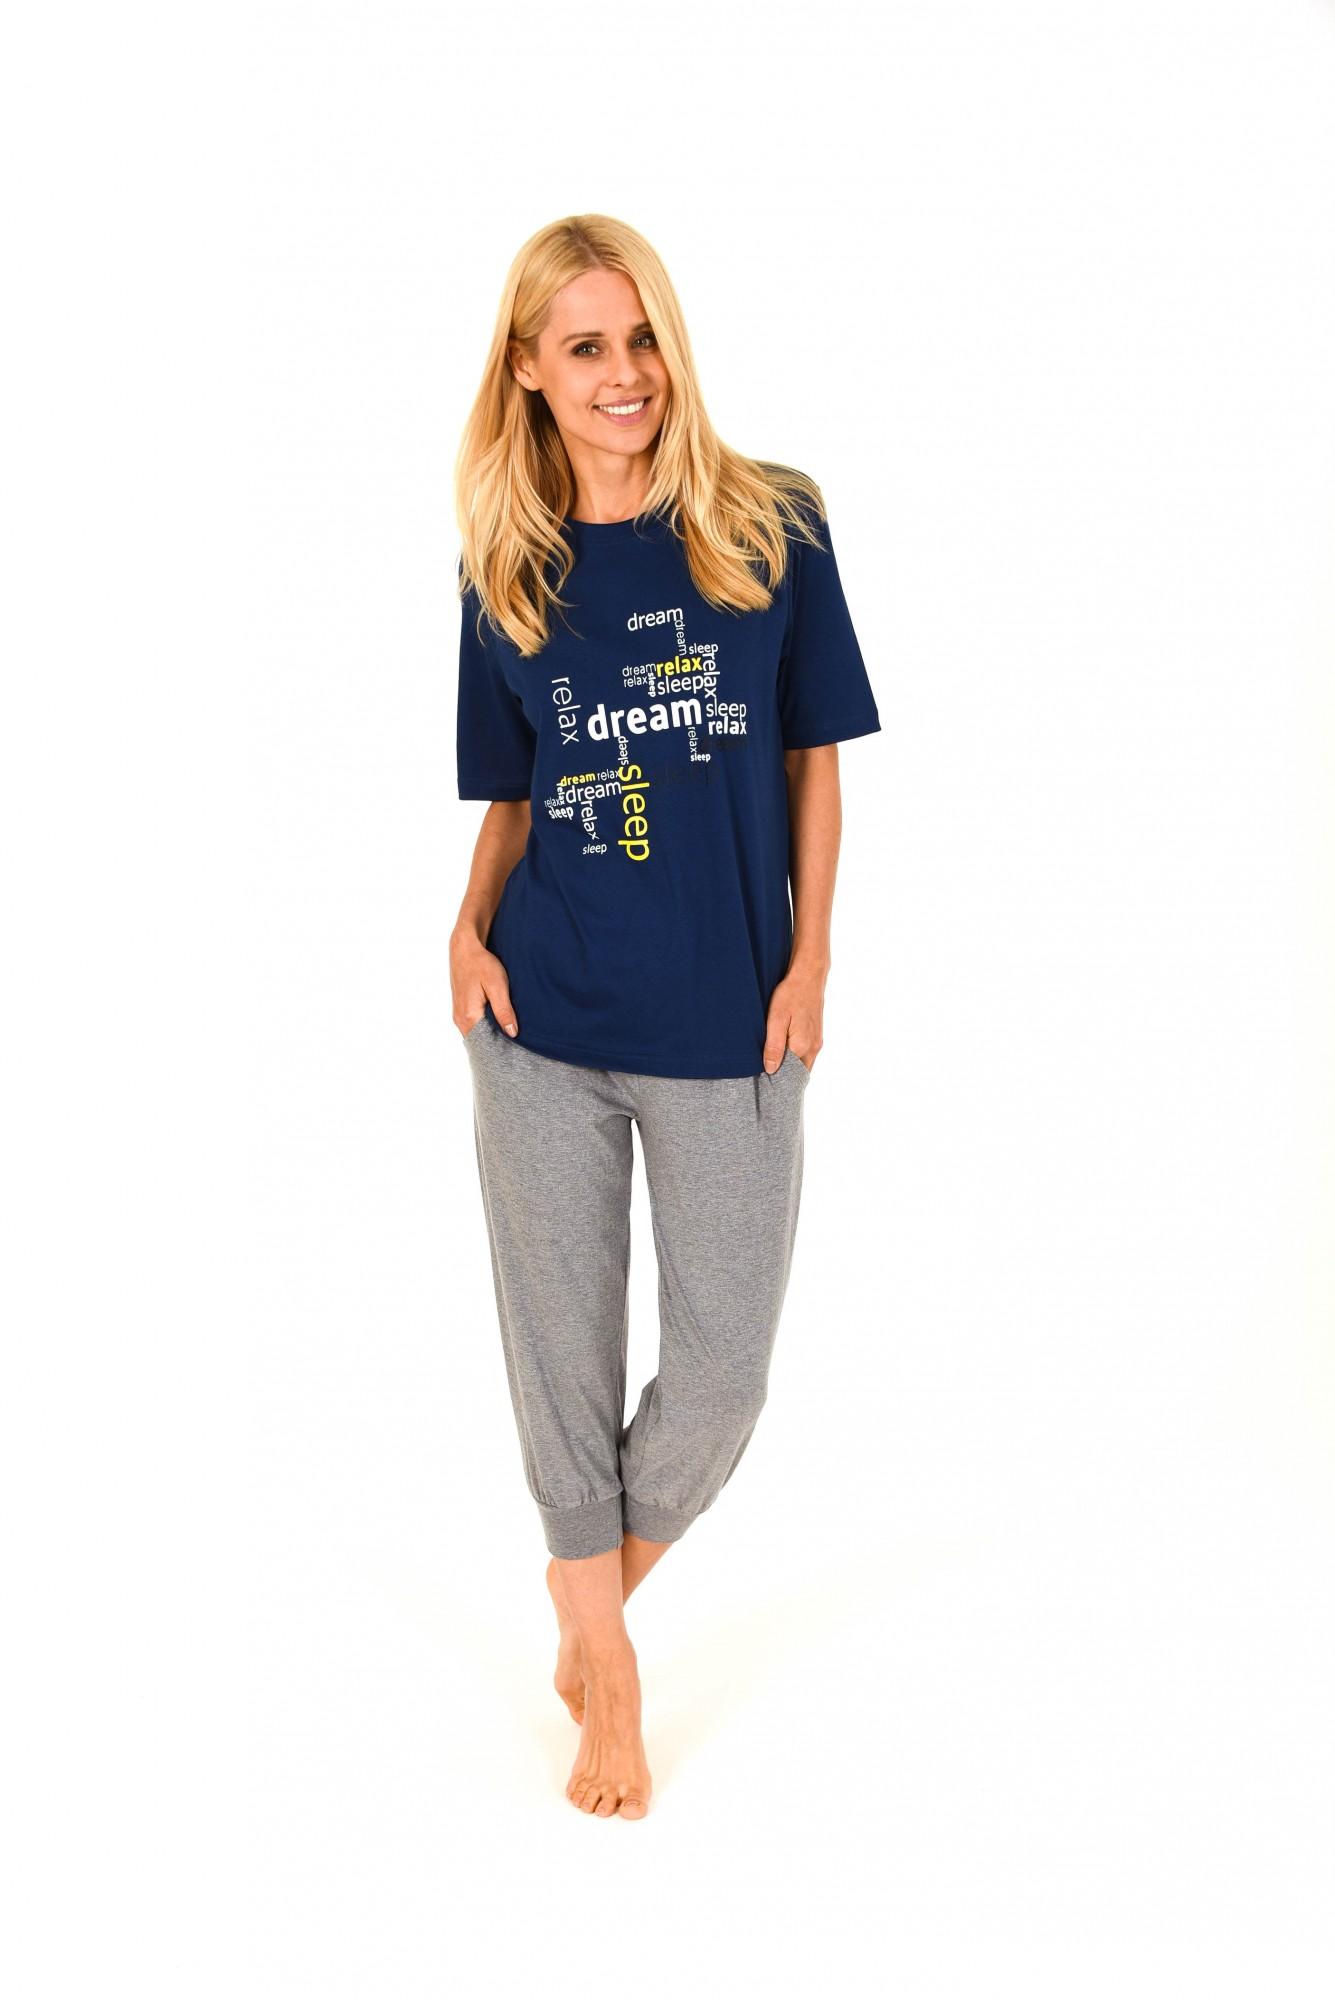 Damen Capri Pyjama 7/8-lange Hose und kurzarm Oberteil – 171 204 90 828 – Bild 1